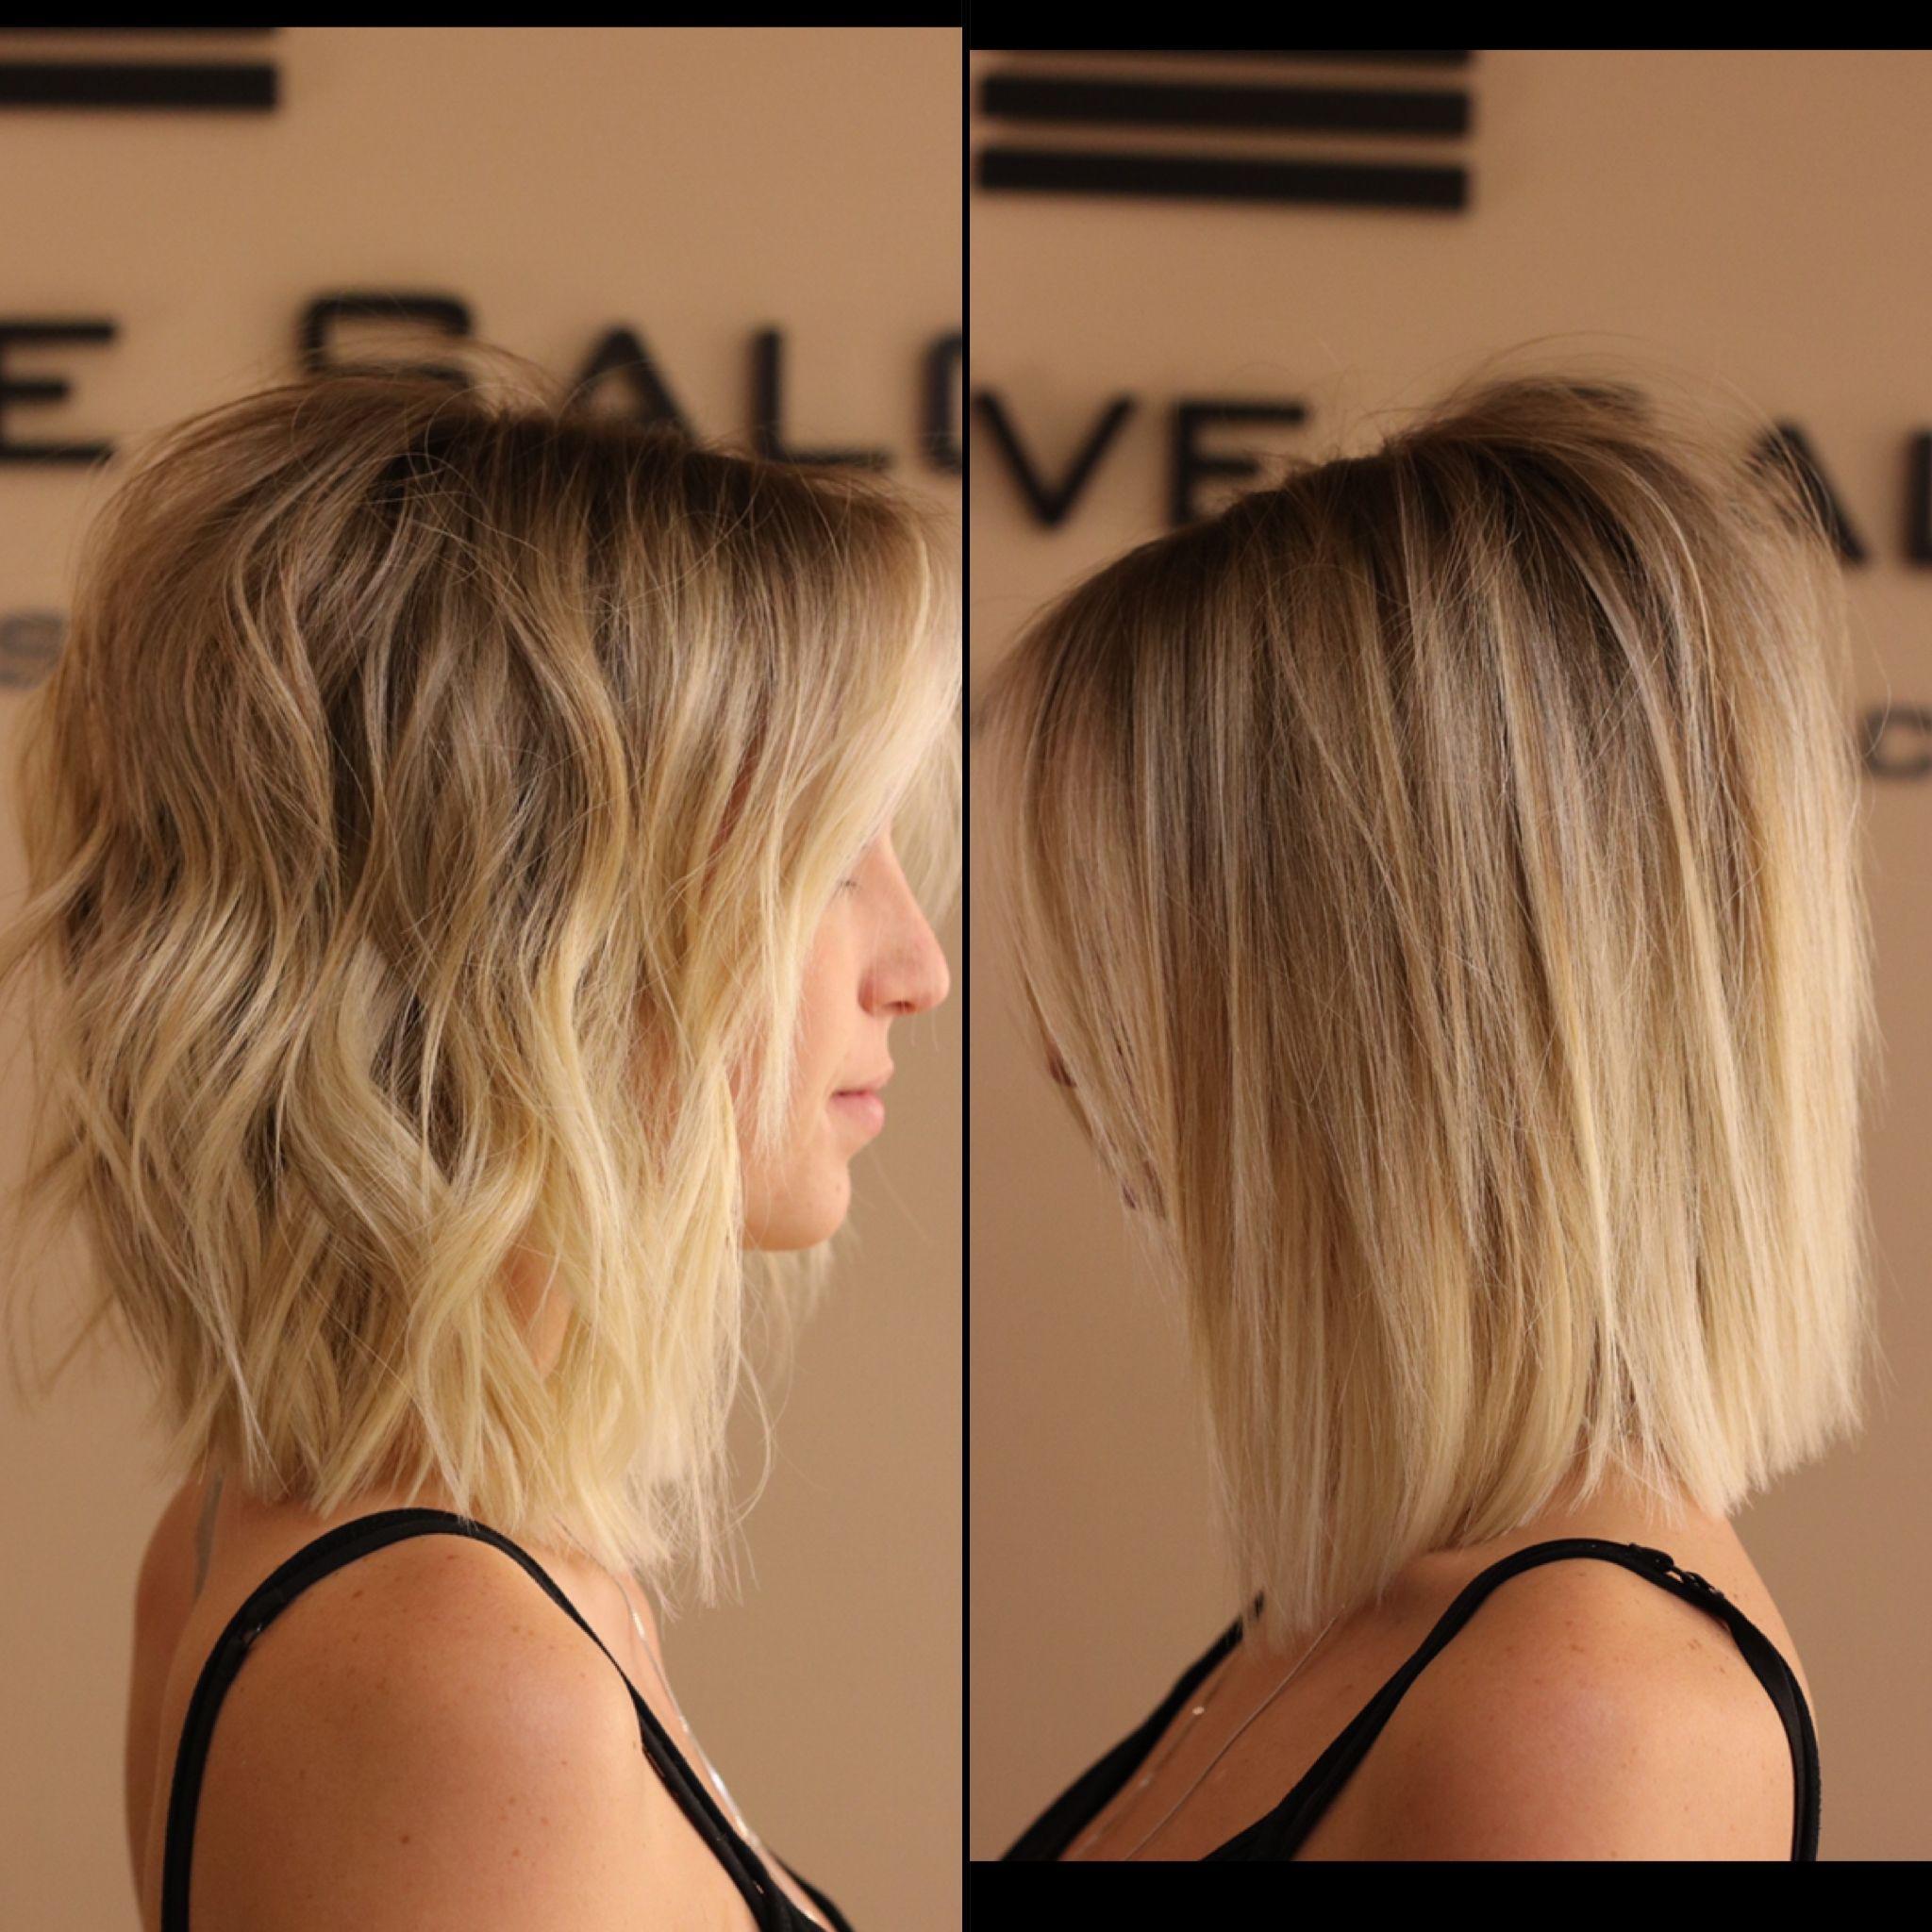 Done-Undone #modernbob #bob #bobcut #haircut #bluntbob #text